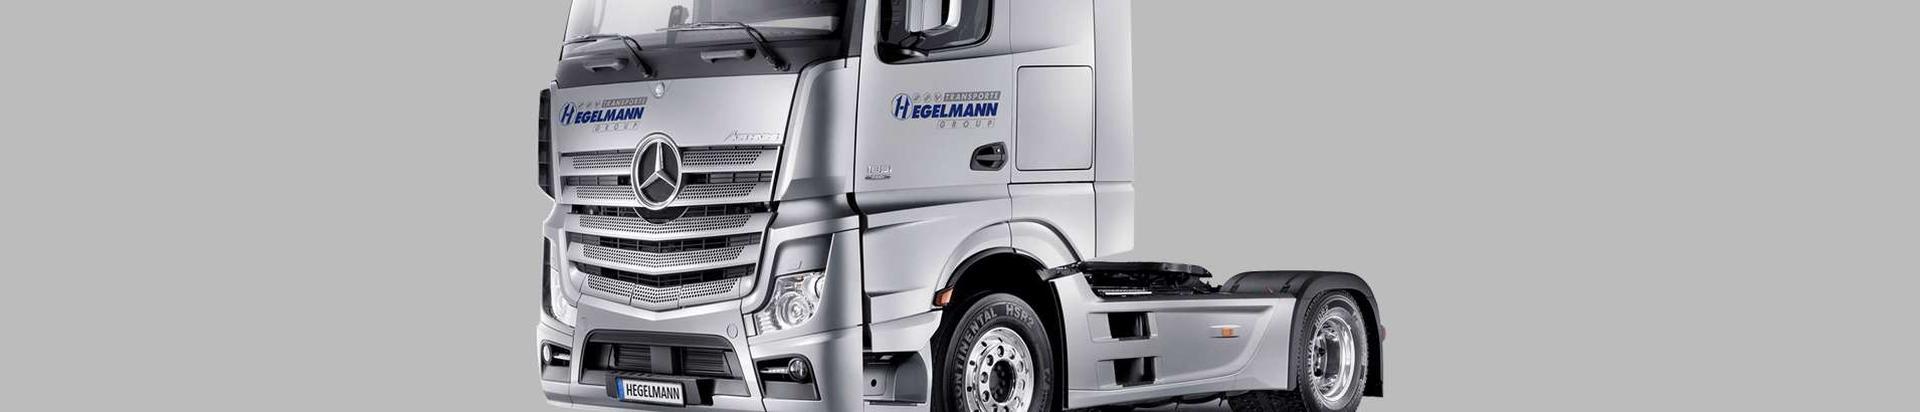 12939662_hegelmann-transporte-ou_61500349_xl.jpg